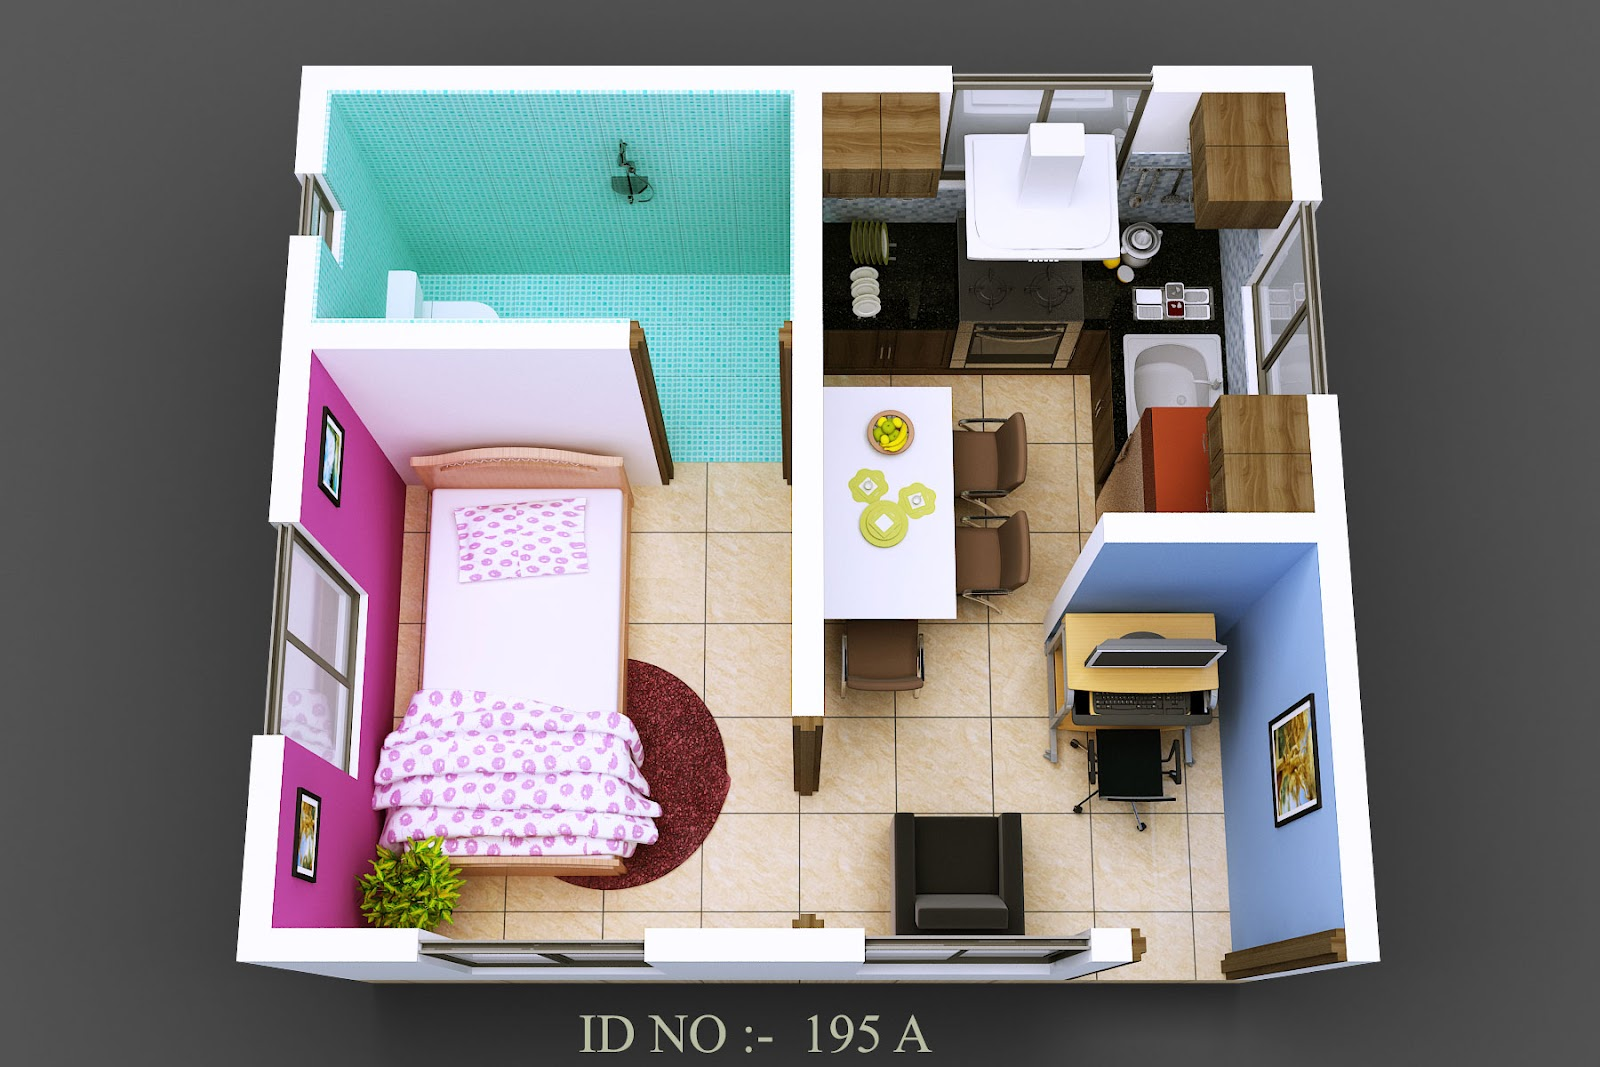 Best Home Design Apps Games Hd Home Design